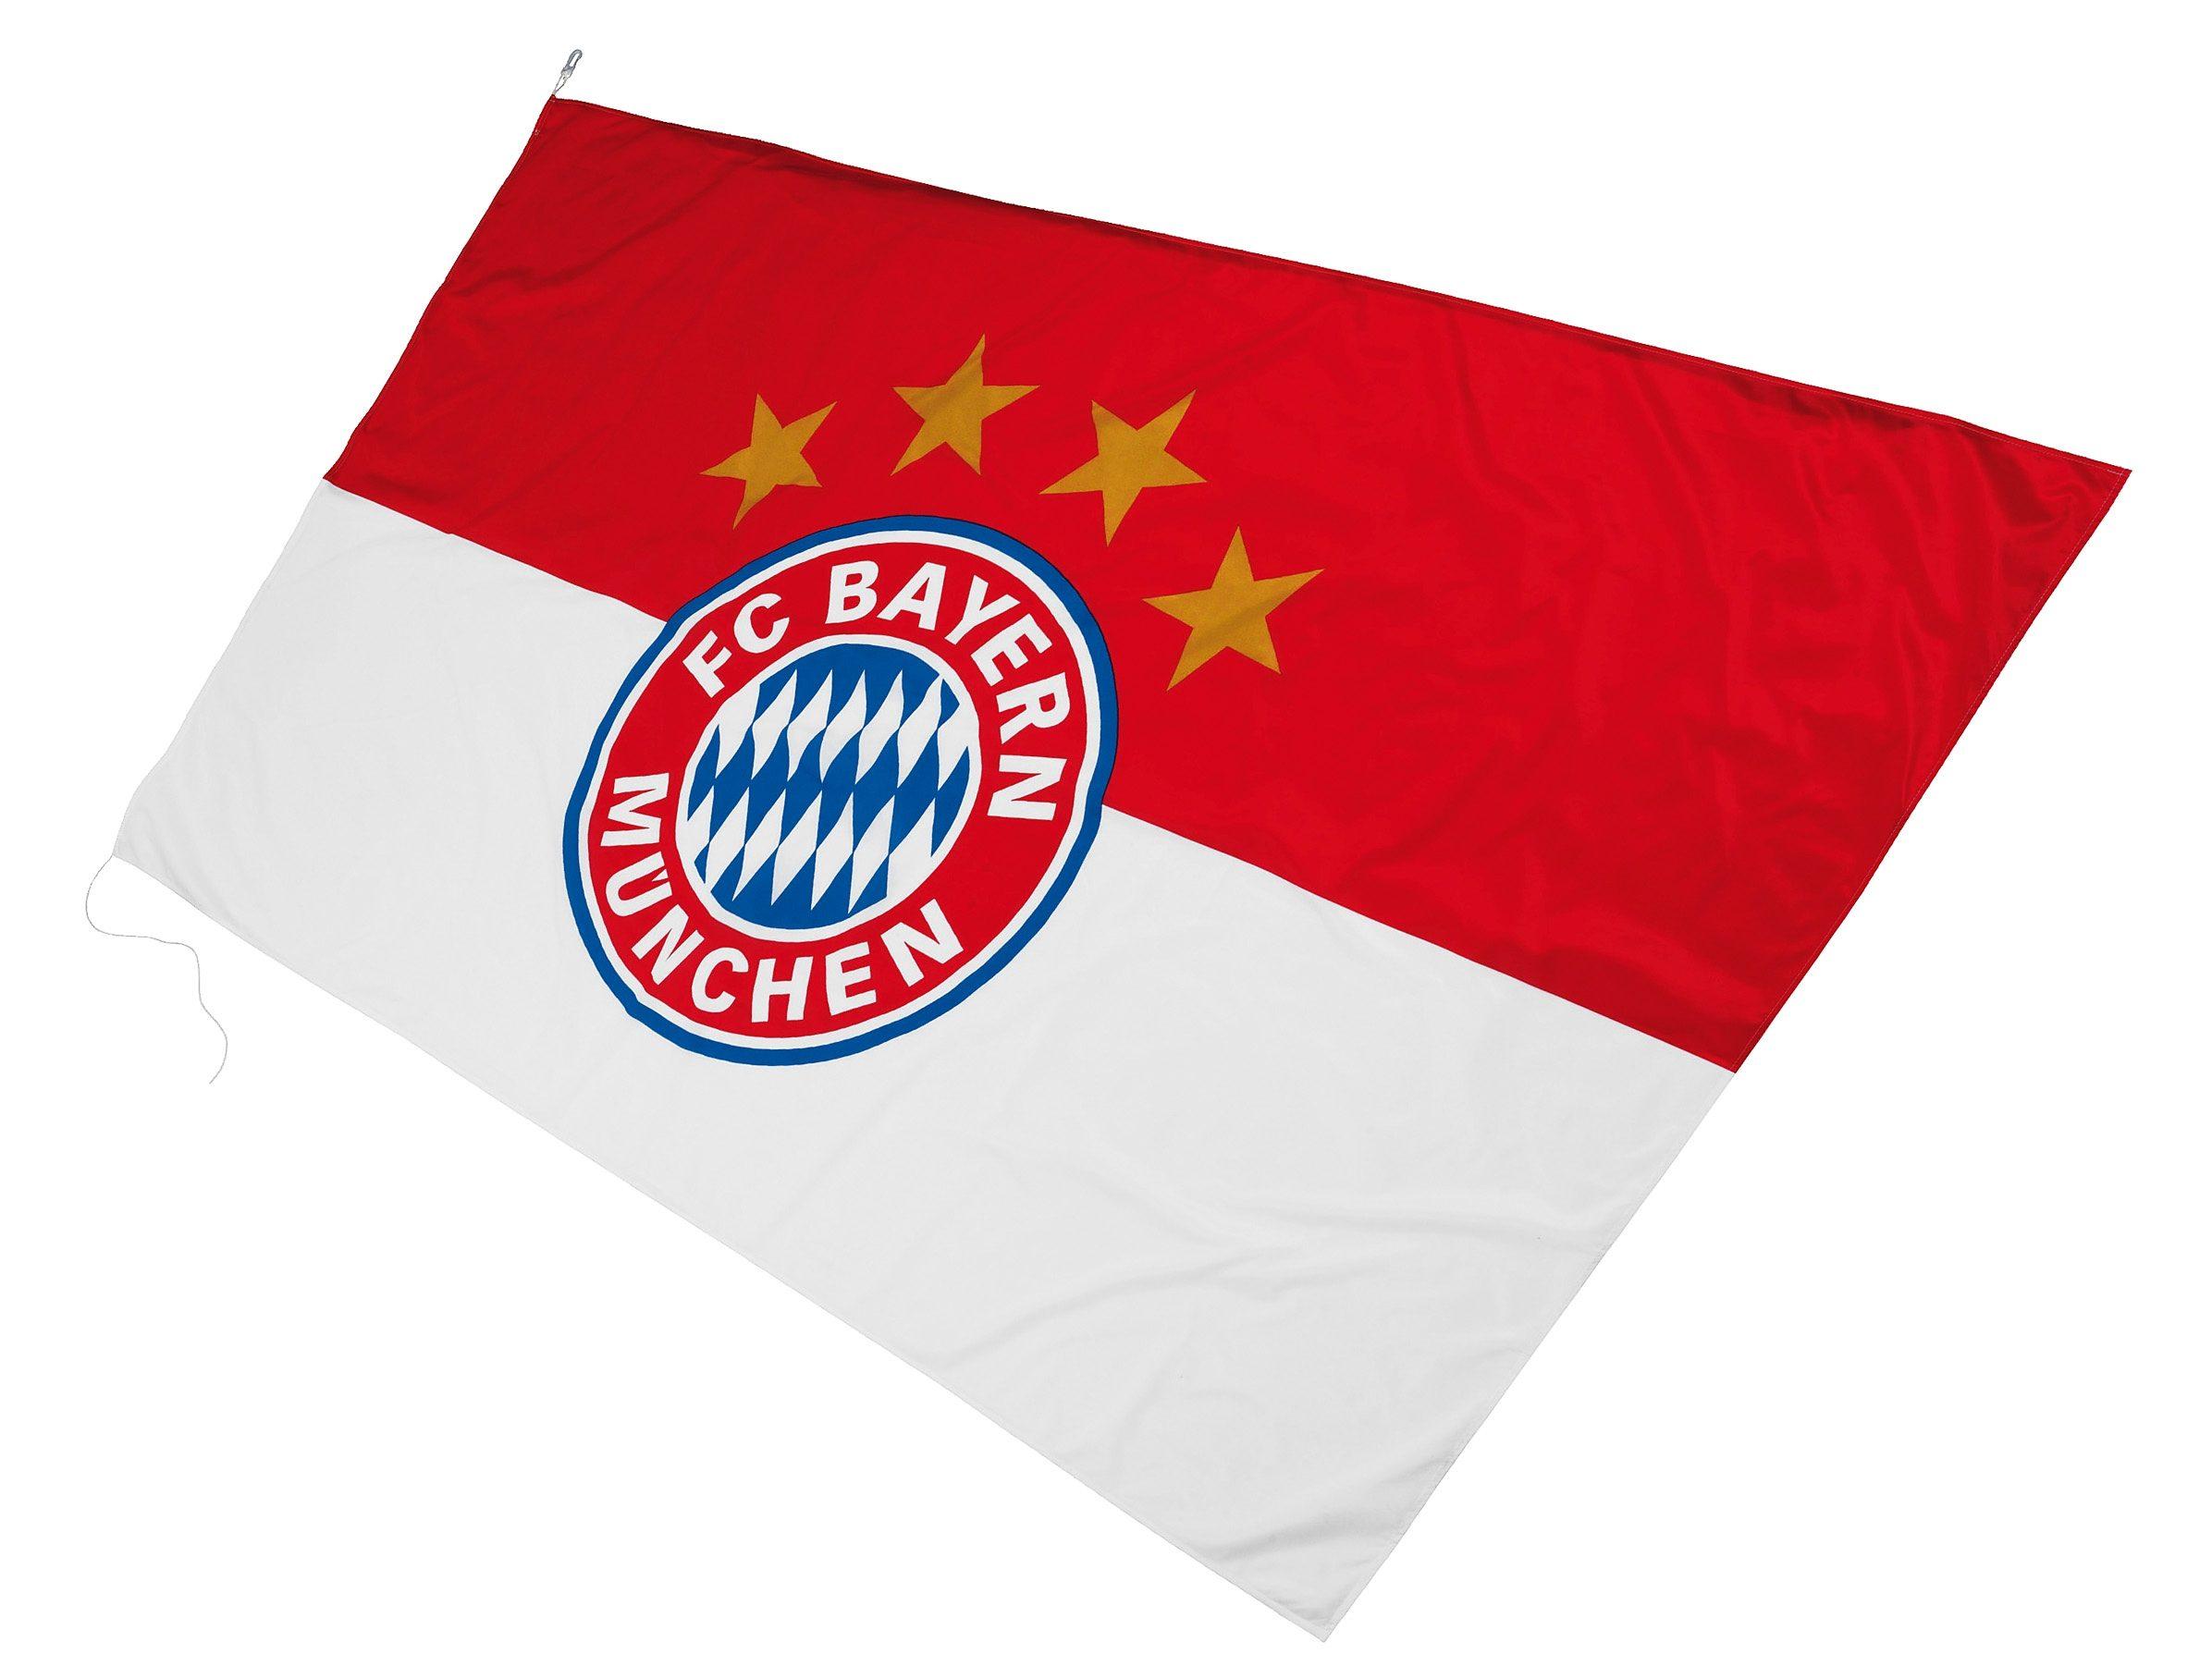 FC Bayern Fahne FC Bayern Hissfahne mit Logo, rot